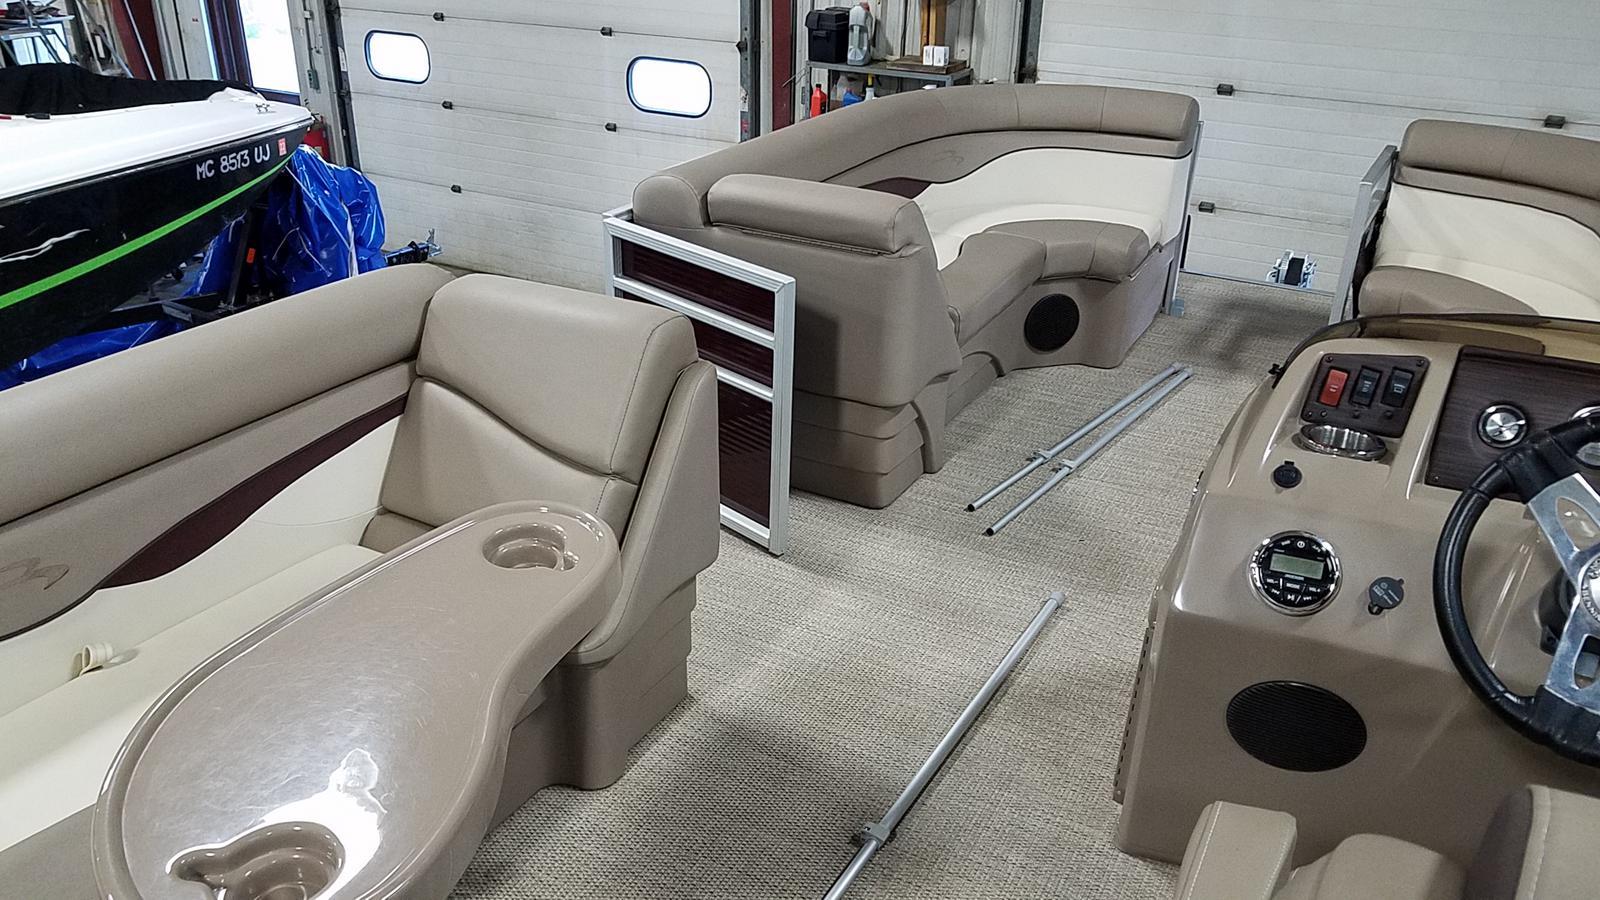 2019 Bennington boat for sale, model of the boat is 21 SLX & Image # 11 of 15